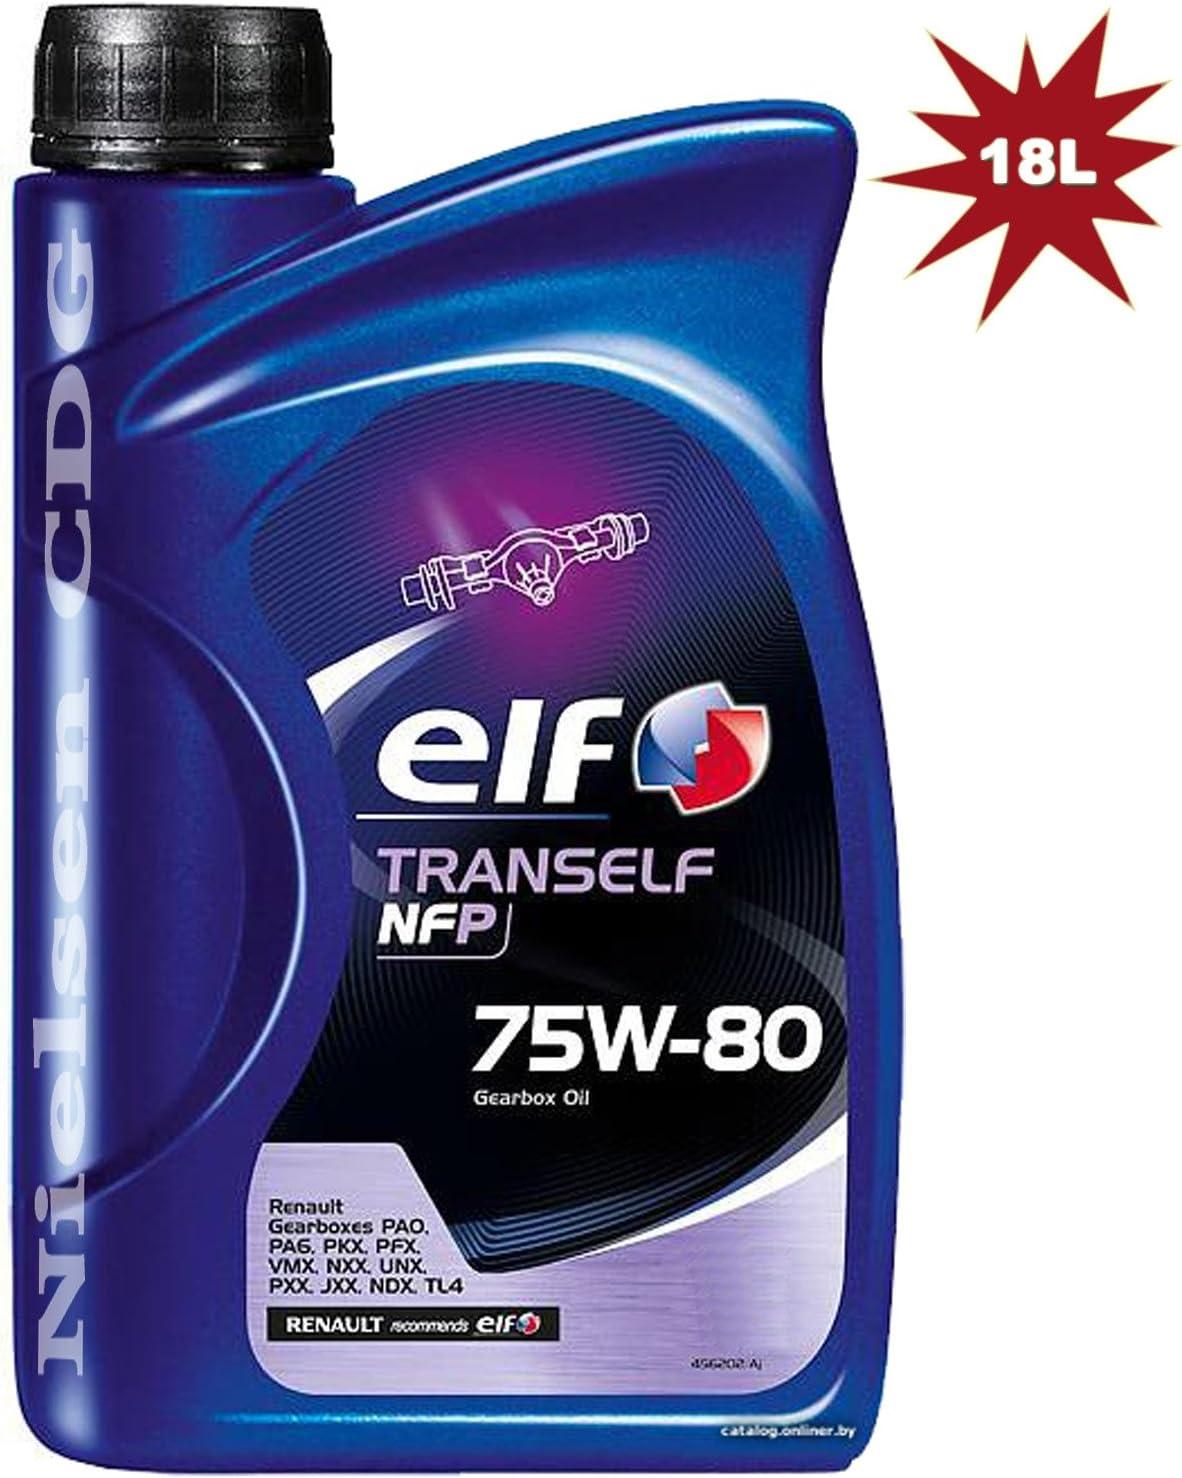 Elfo tranself Fen 75 W80 Gear aceite 18 x 1 L=18 L: Amazon ...